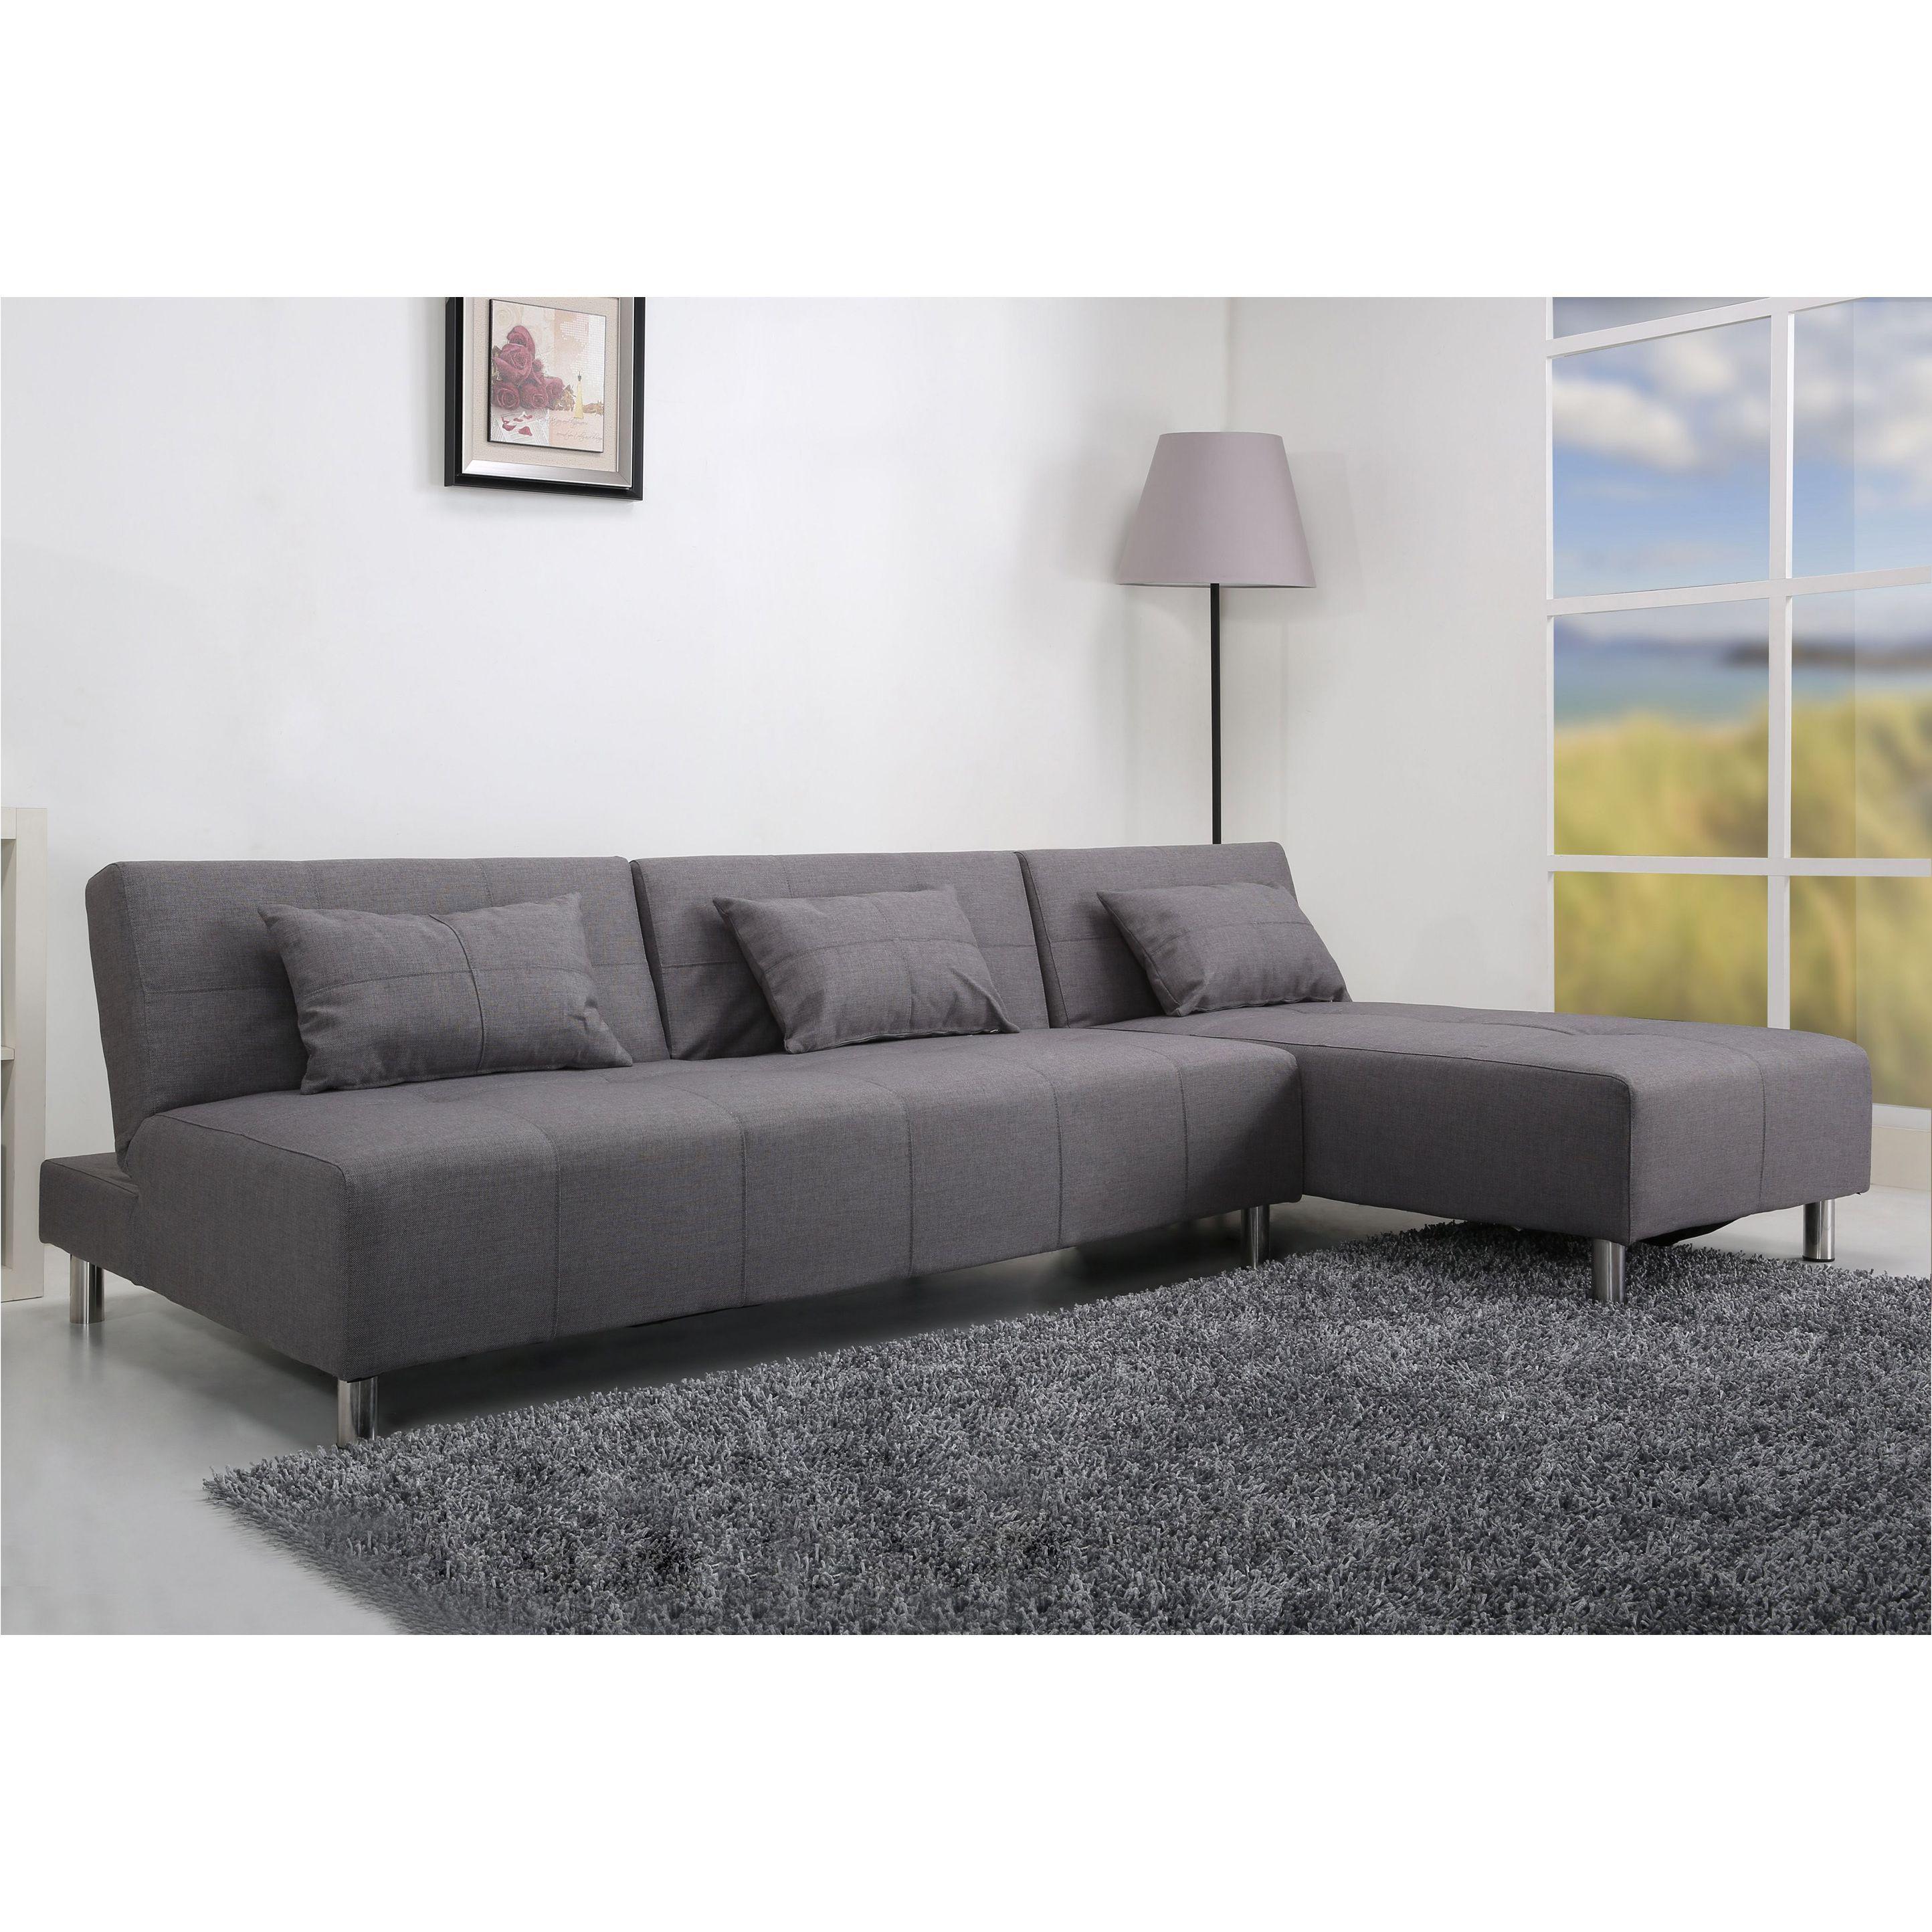 Charmant Gold Sparrow Atlanta Light Grey Convertible Sectional Sofa Bed (Atlanta  Light Gray Convertible Sectional Sofa Bed)